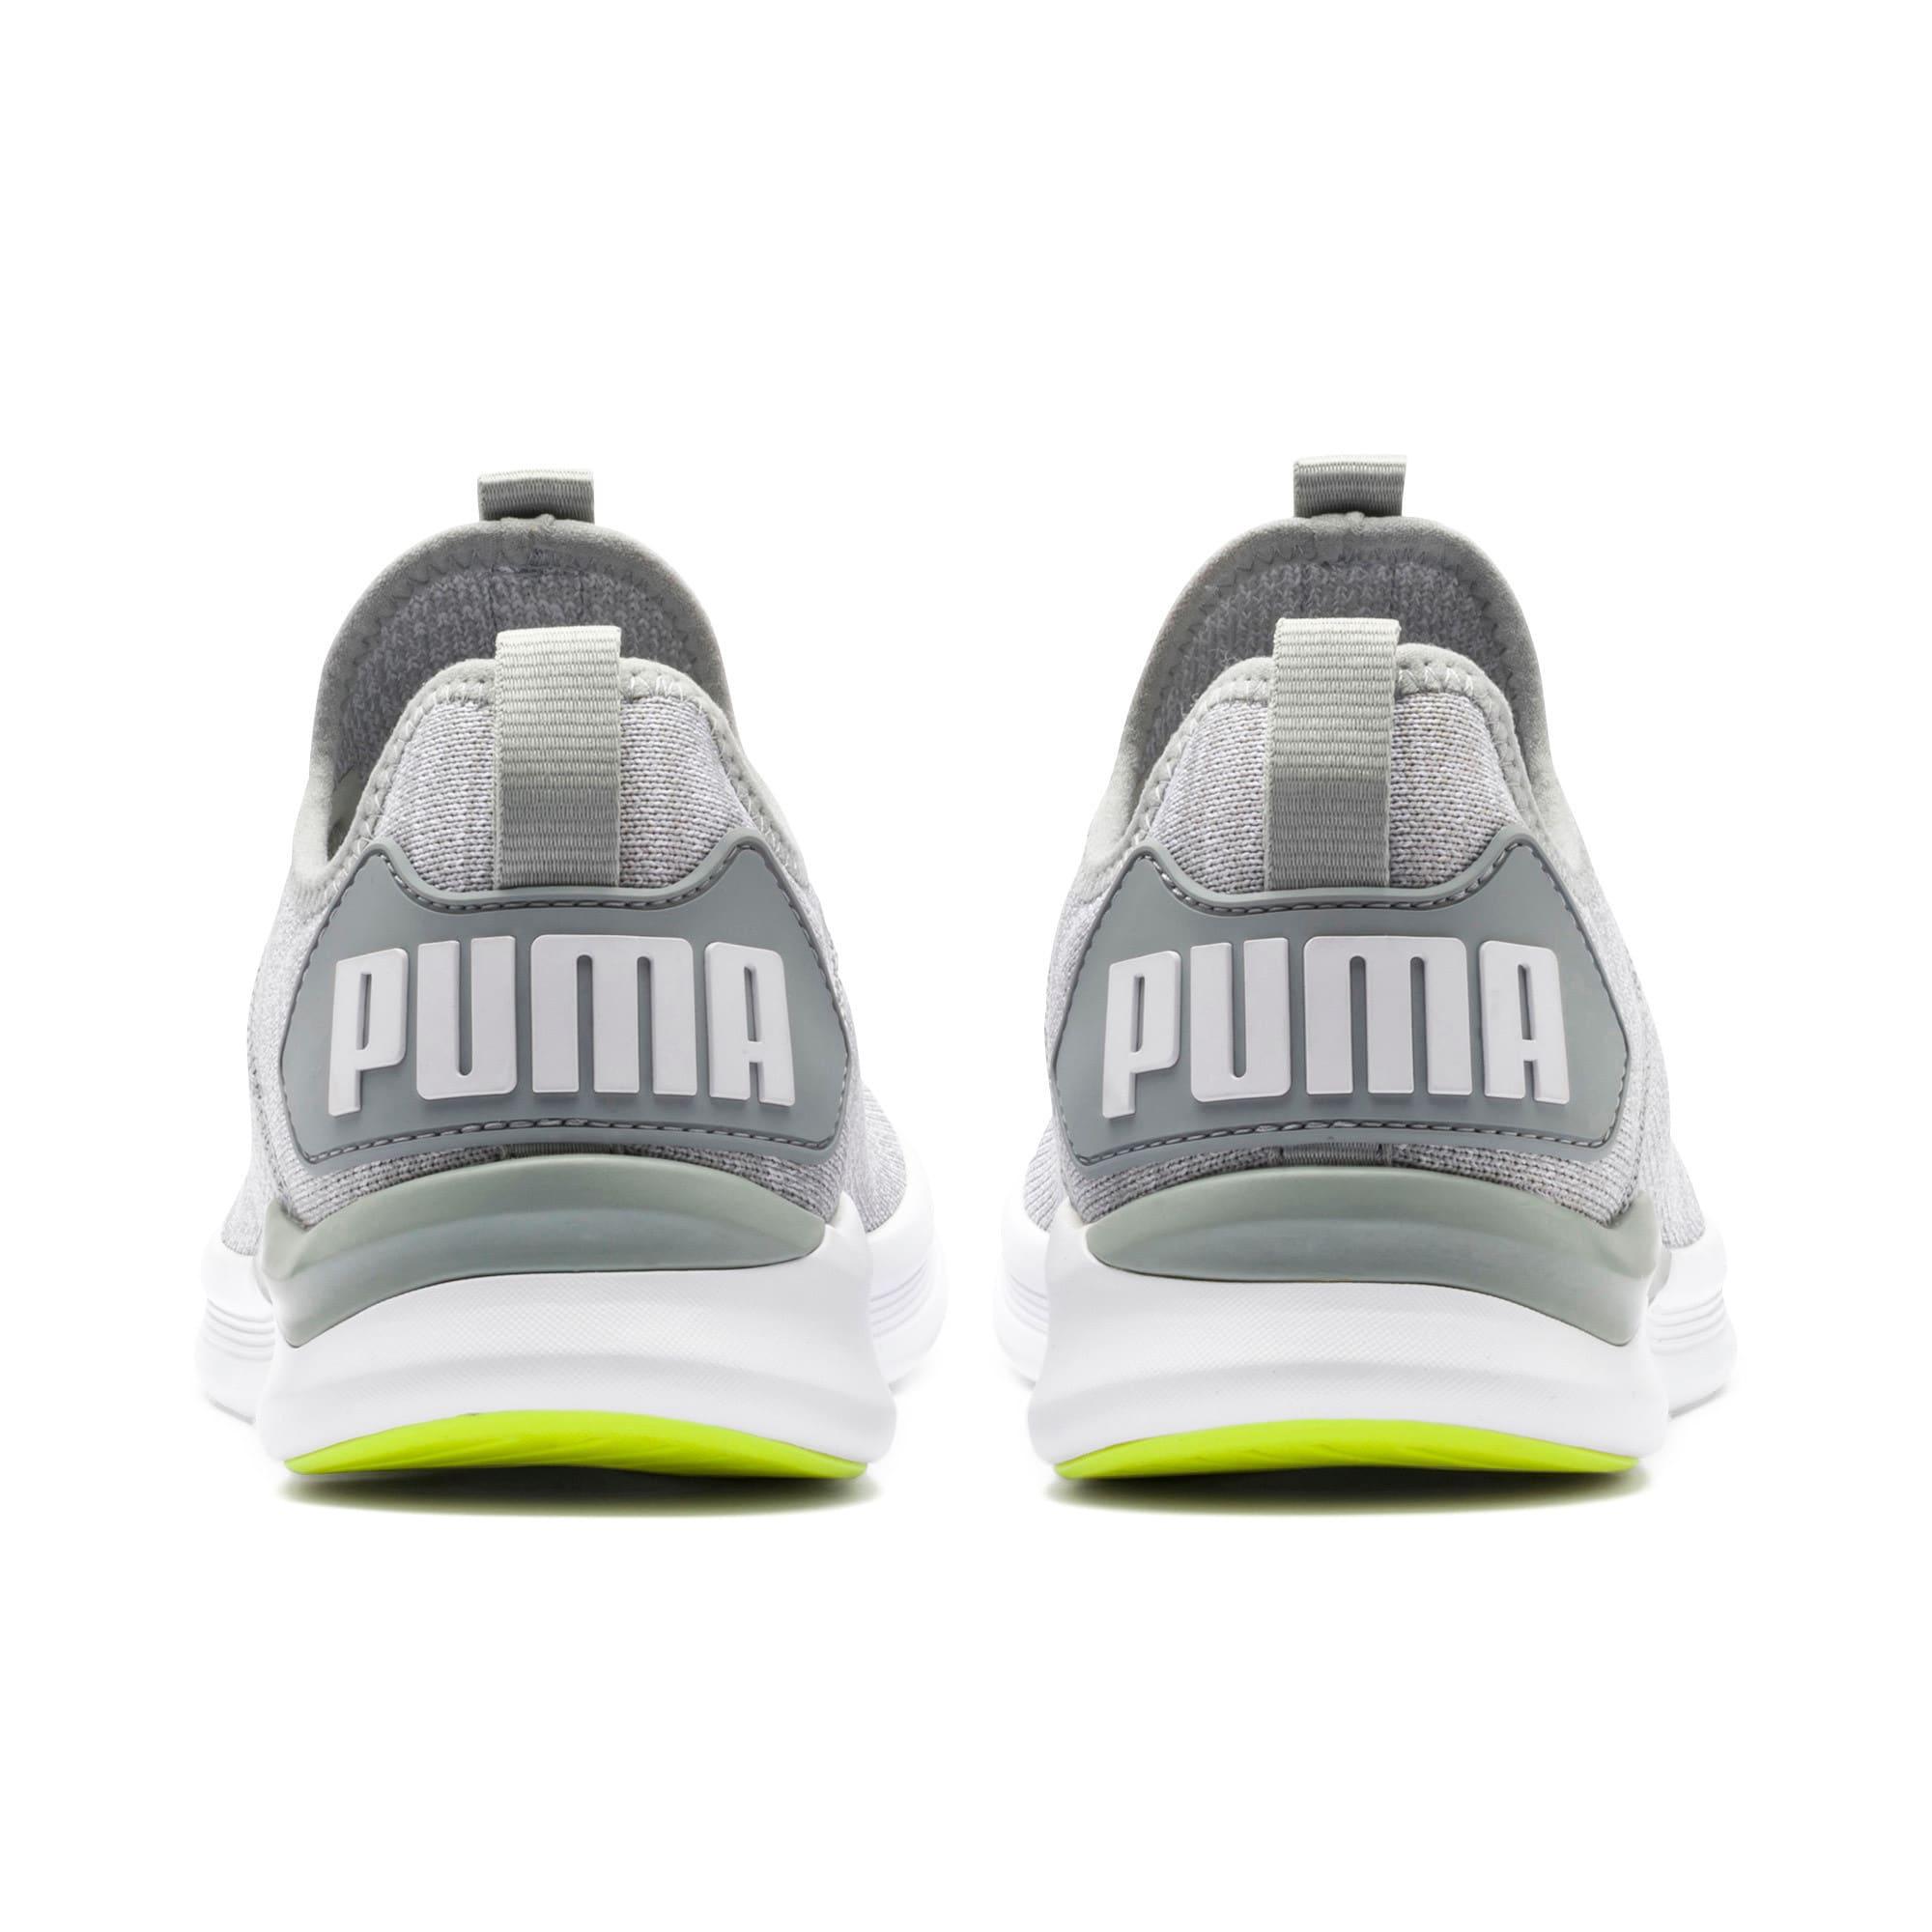 Thumbnail 4 of IGNITE Flash evoKNIT Women's Running Shoes, Quarry-White-Milky Blue, medium